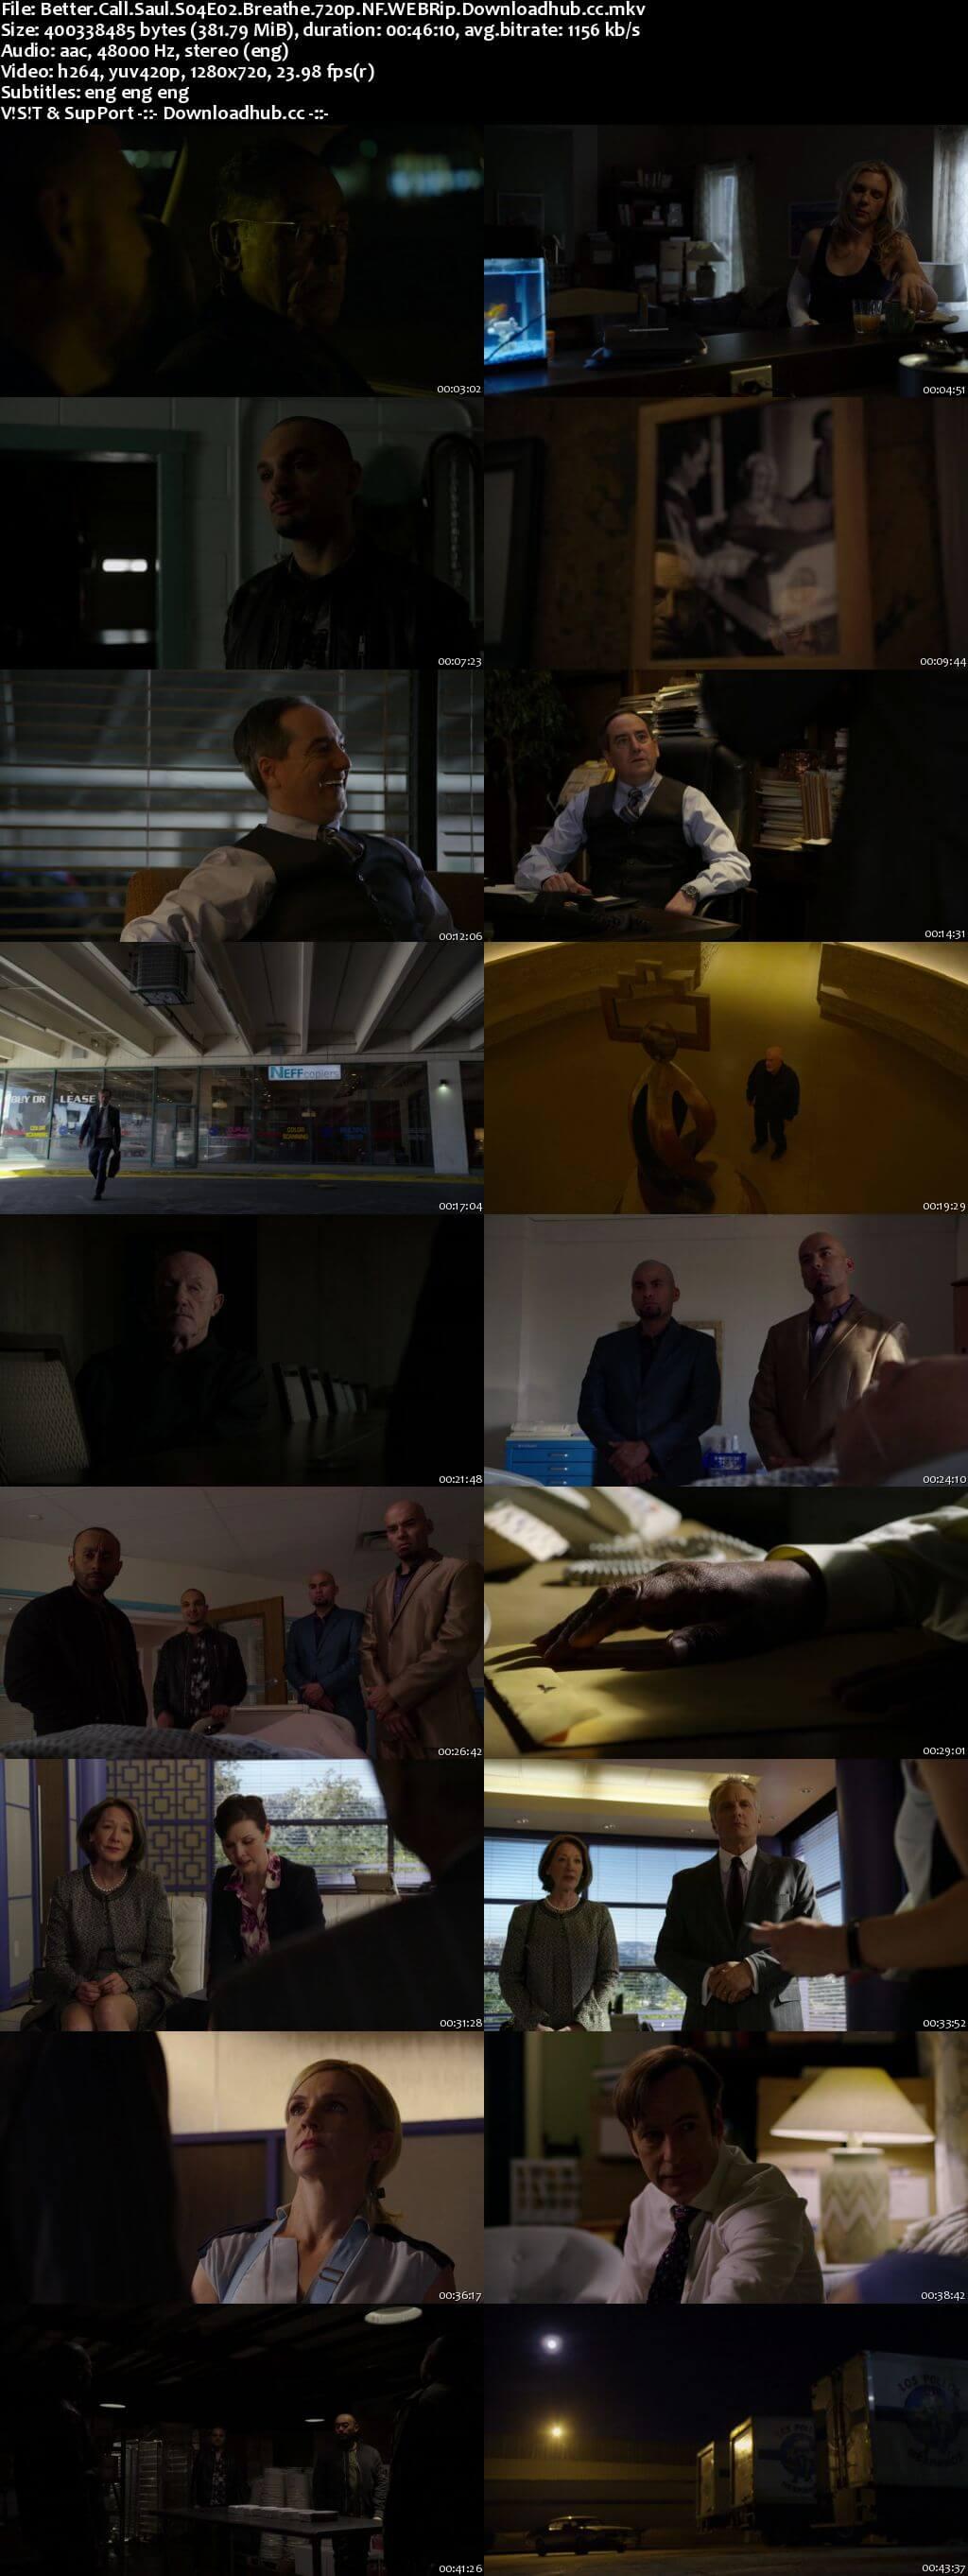 Better Call Saul S04E02 380MB WEB-DL 720p x264 MSubs